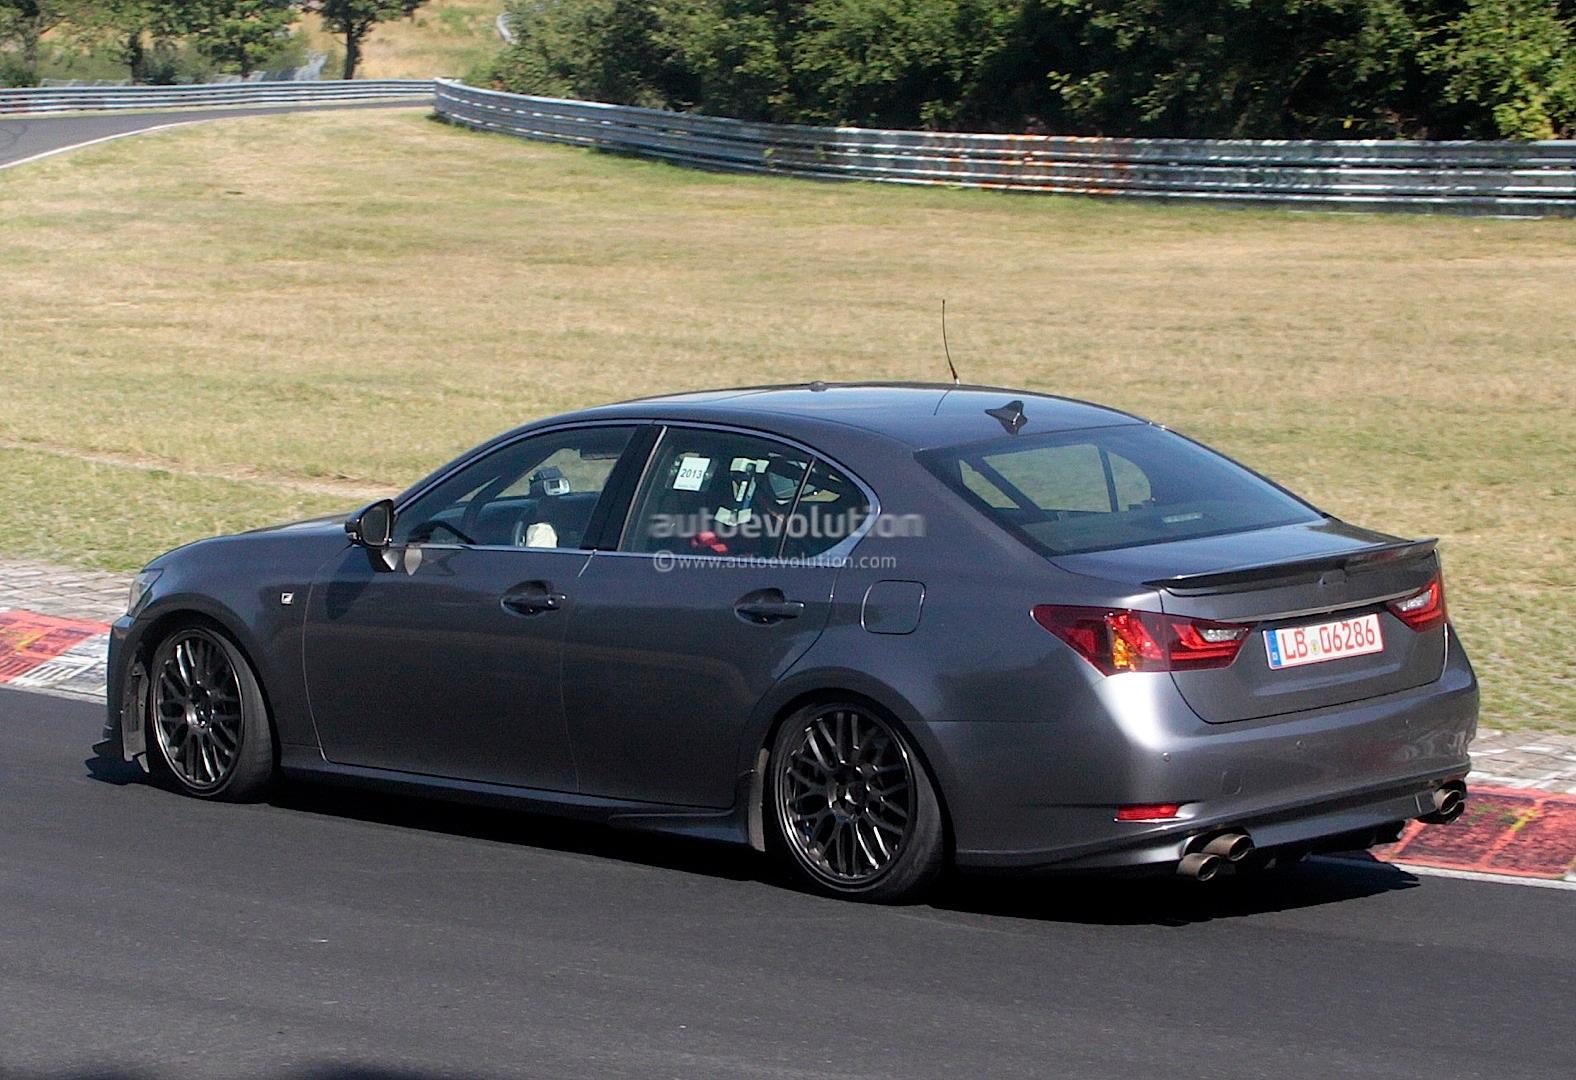 Lexus Nx Turbo >> Spyshots: Lexus GS F Performance Sedan Prototype Features ...